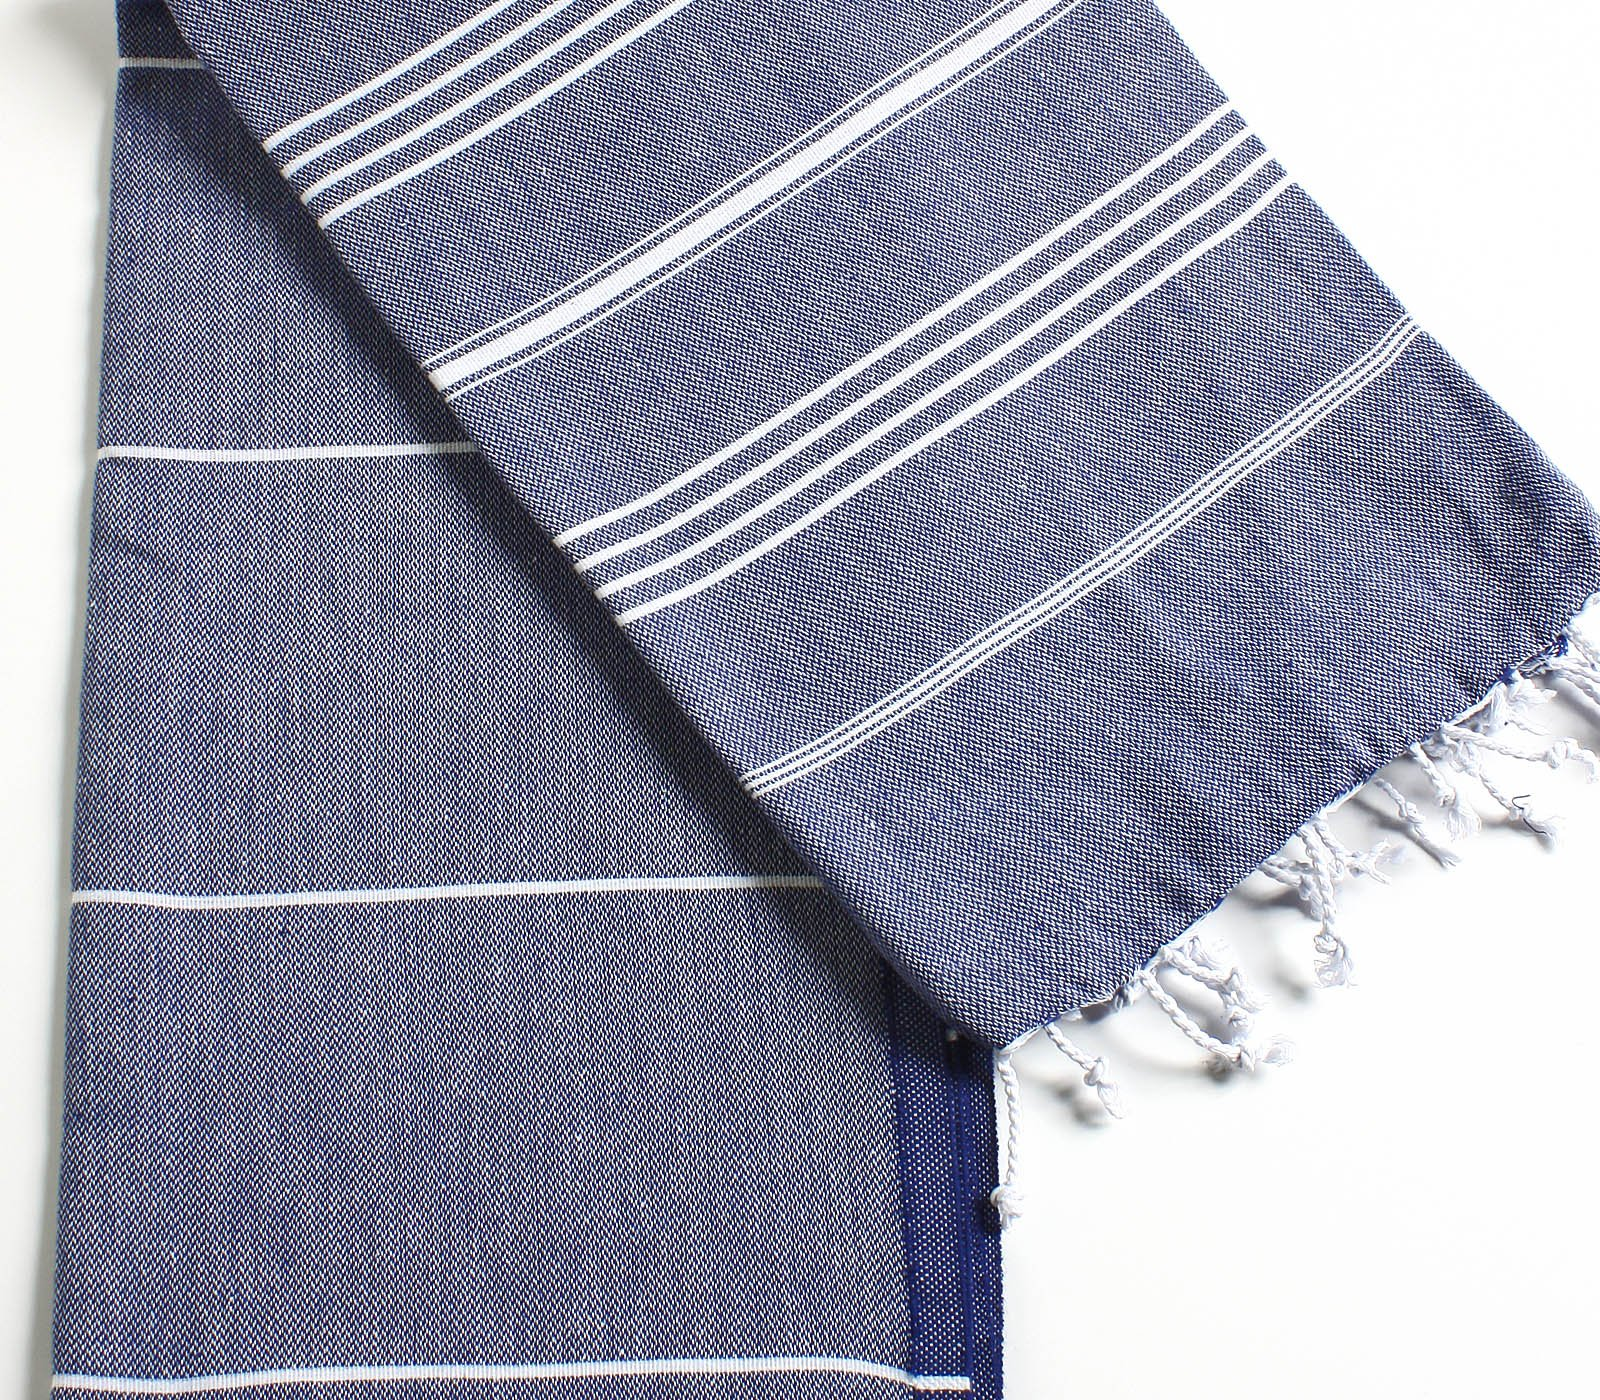 Cacala 100% Cotton Pestemal Turkish Bath Towel, 37 x 70, Dark Blue by Cacala (Image #6)